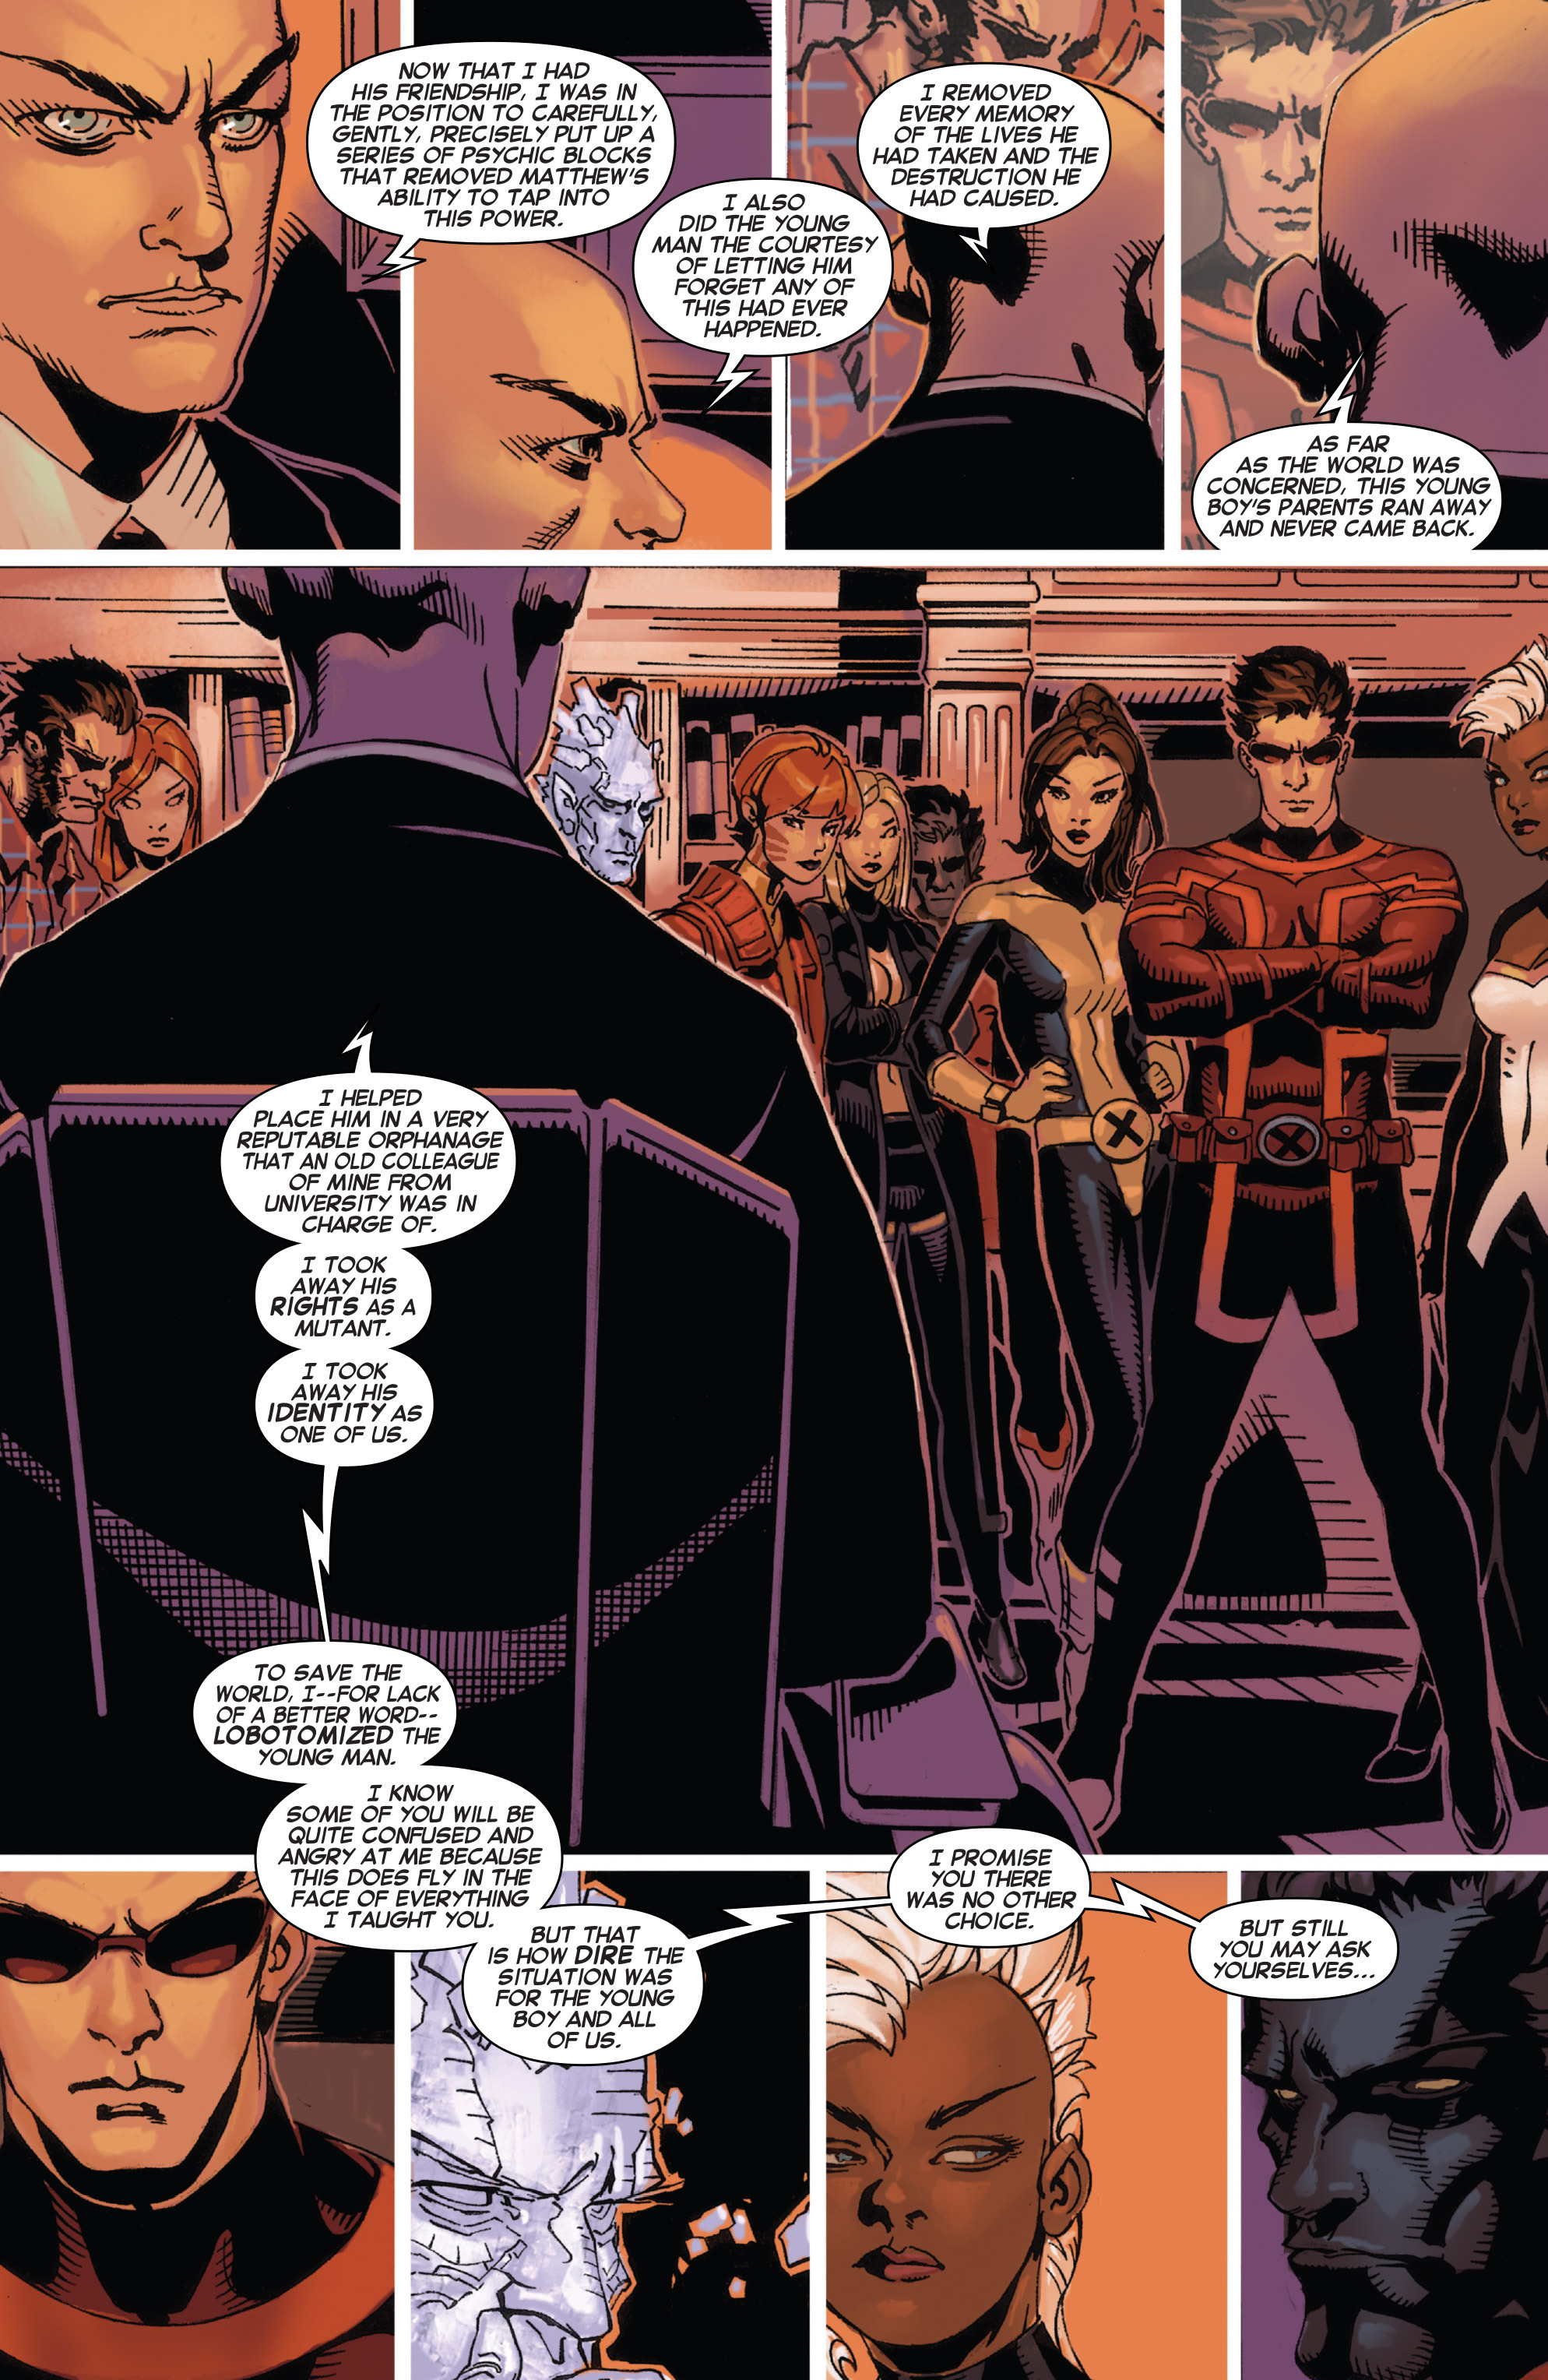 Read online Uncanny X-Men (2013) comic -  Issue # _TPB 4 - vs. S.H.I.E.L.D - 133